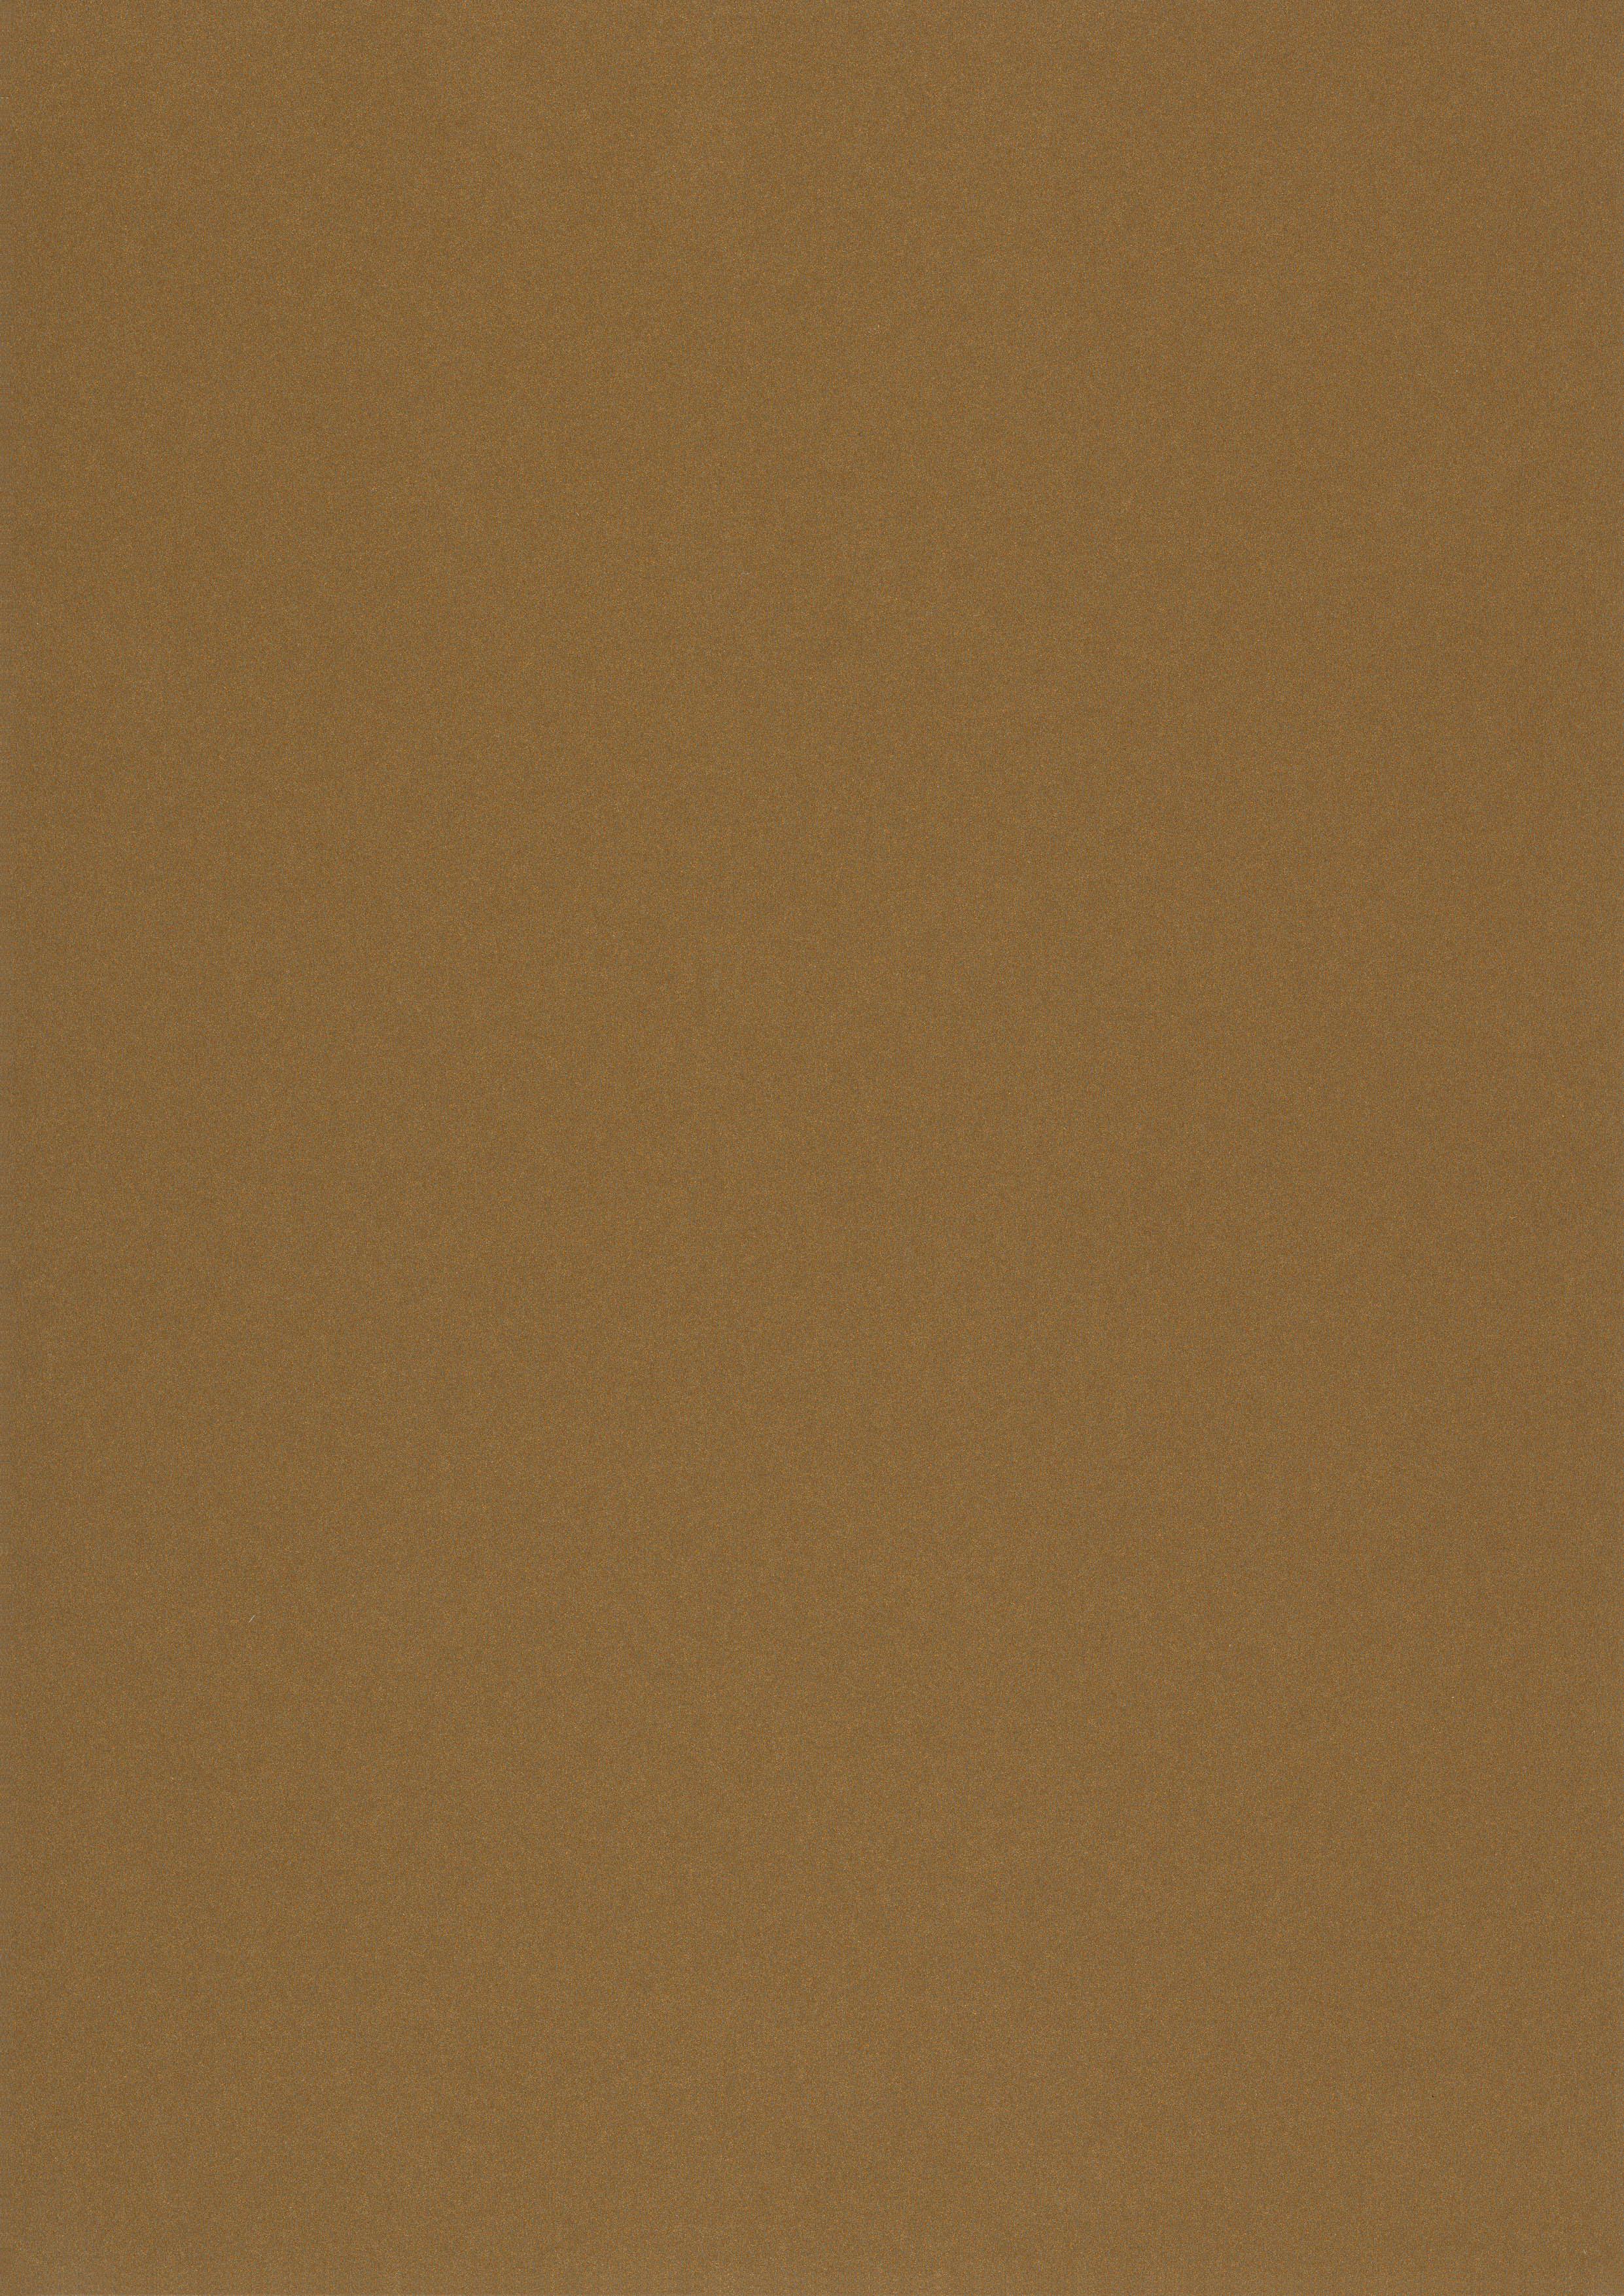 Copper Metallic (F8563MP)